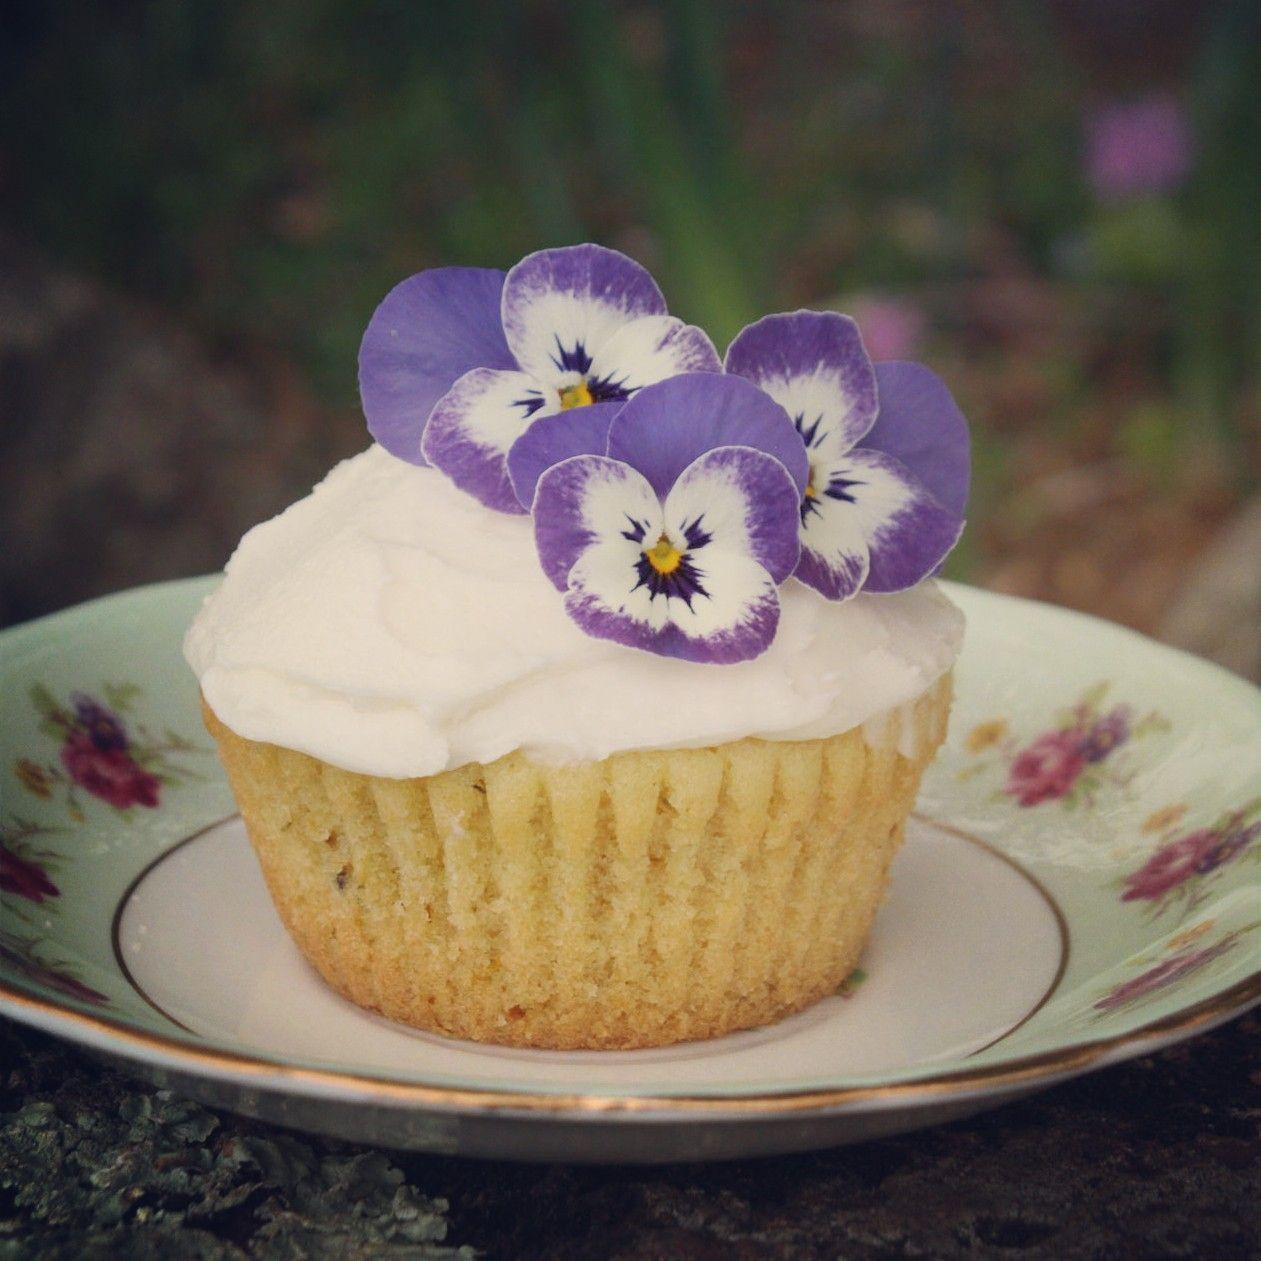 Dandelion Cupcakes Dandelion recipes, Artisan food